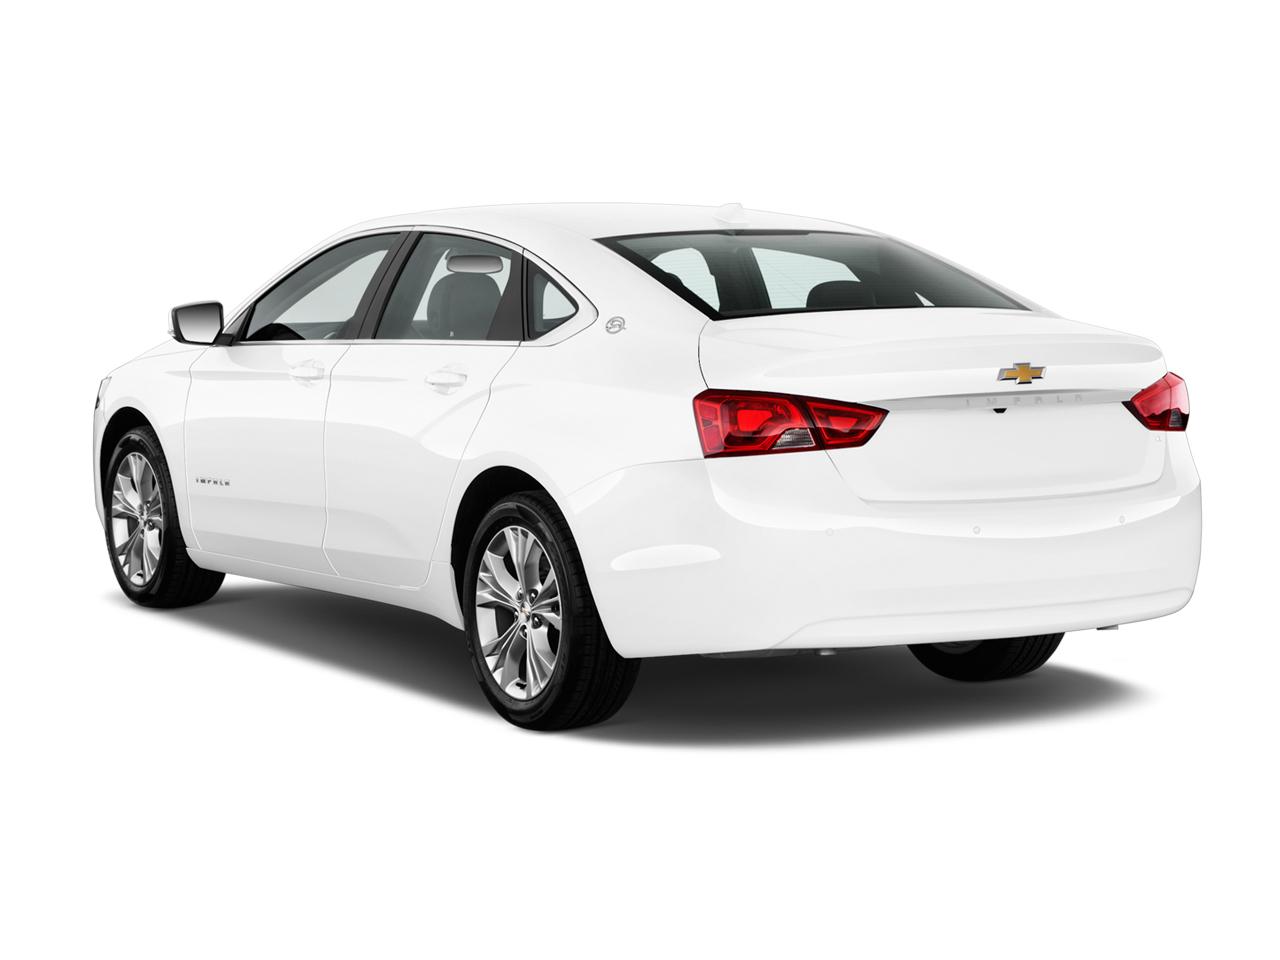 Chevrolet Impala White Rear Side Exterior